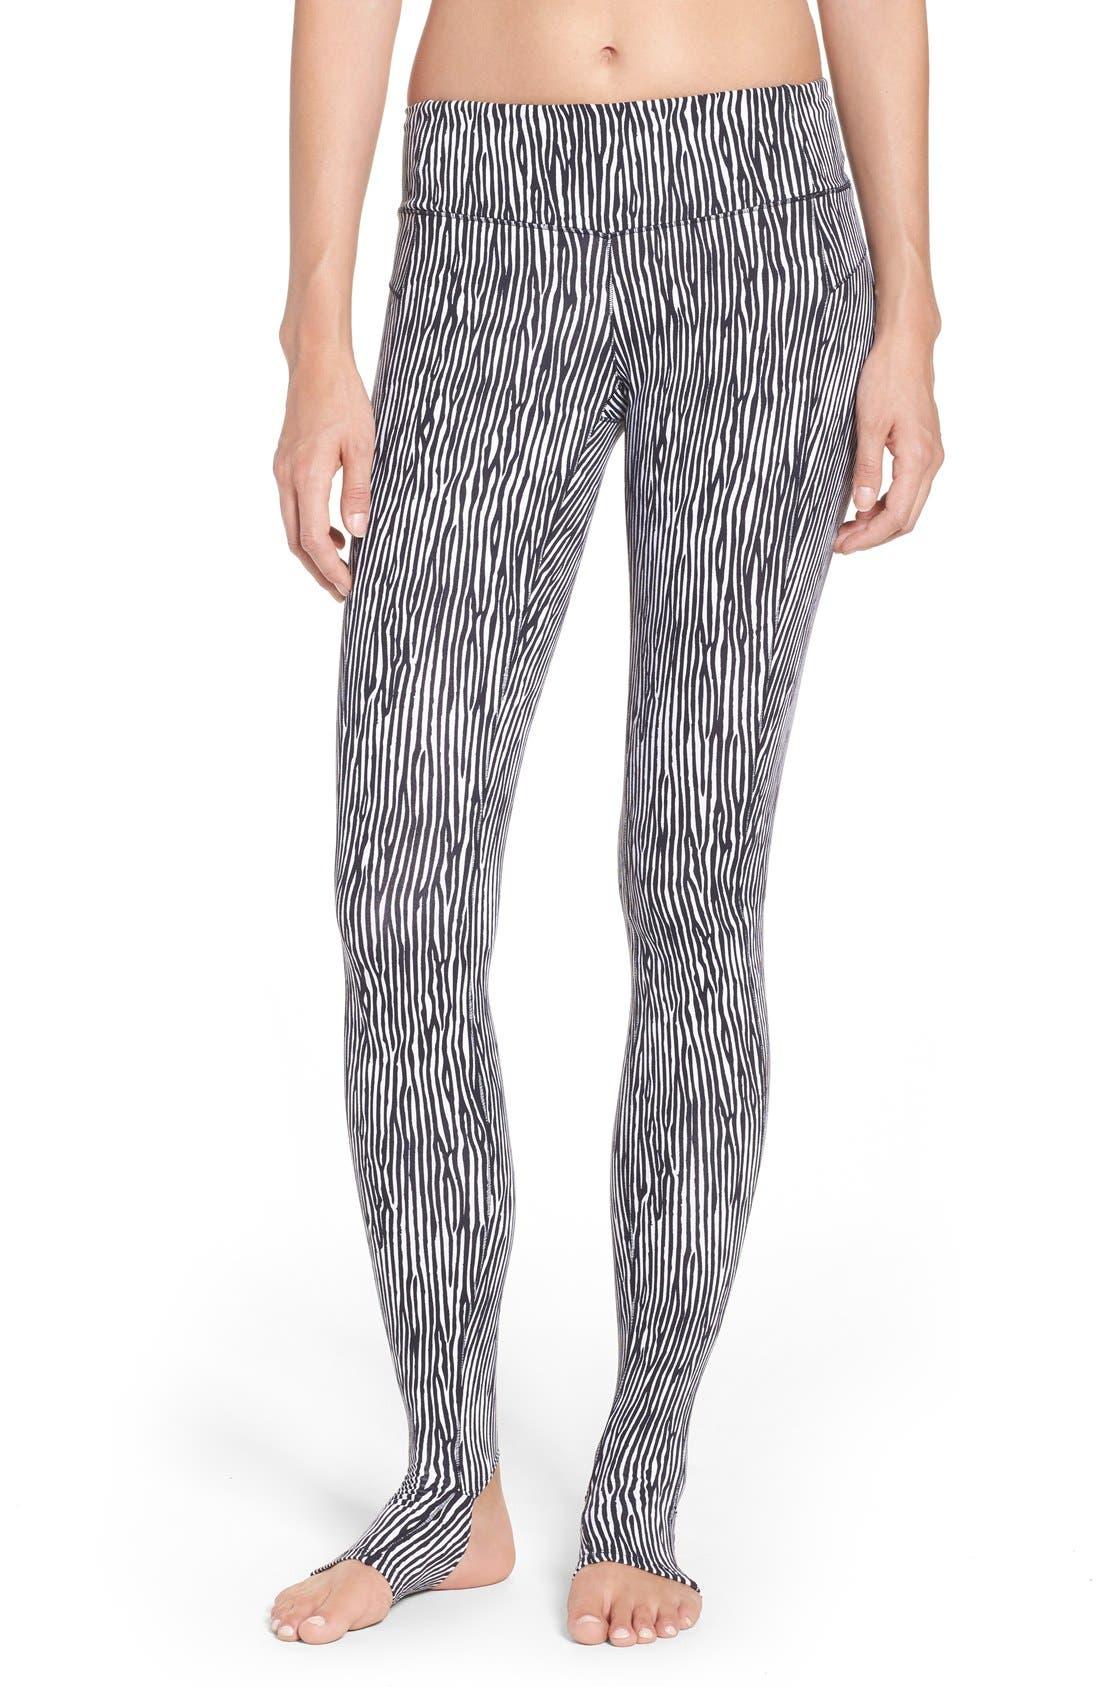 Foiled Stirrup Tights,                         Main,                         color, Black/ White